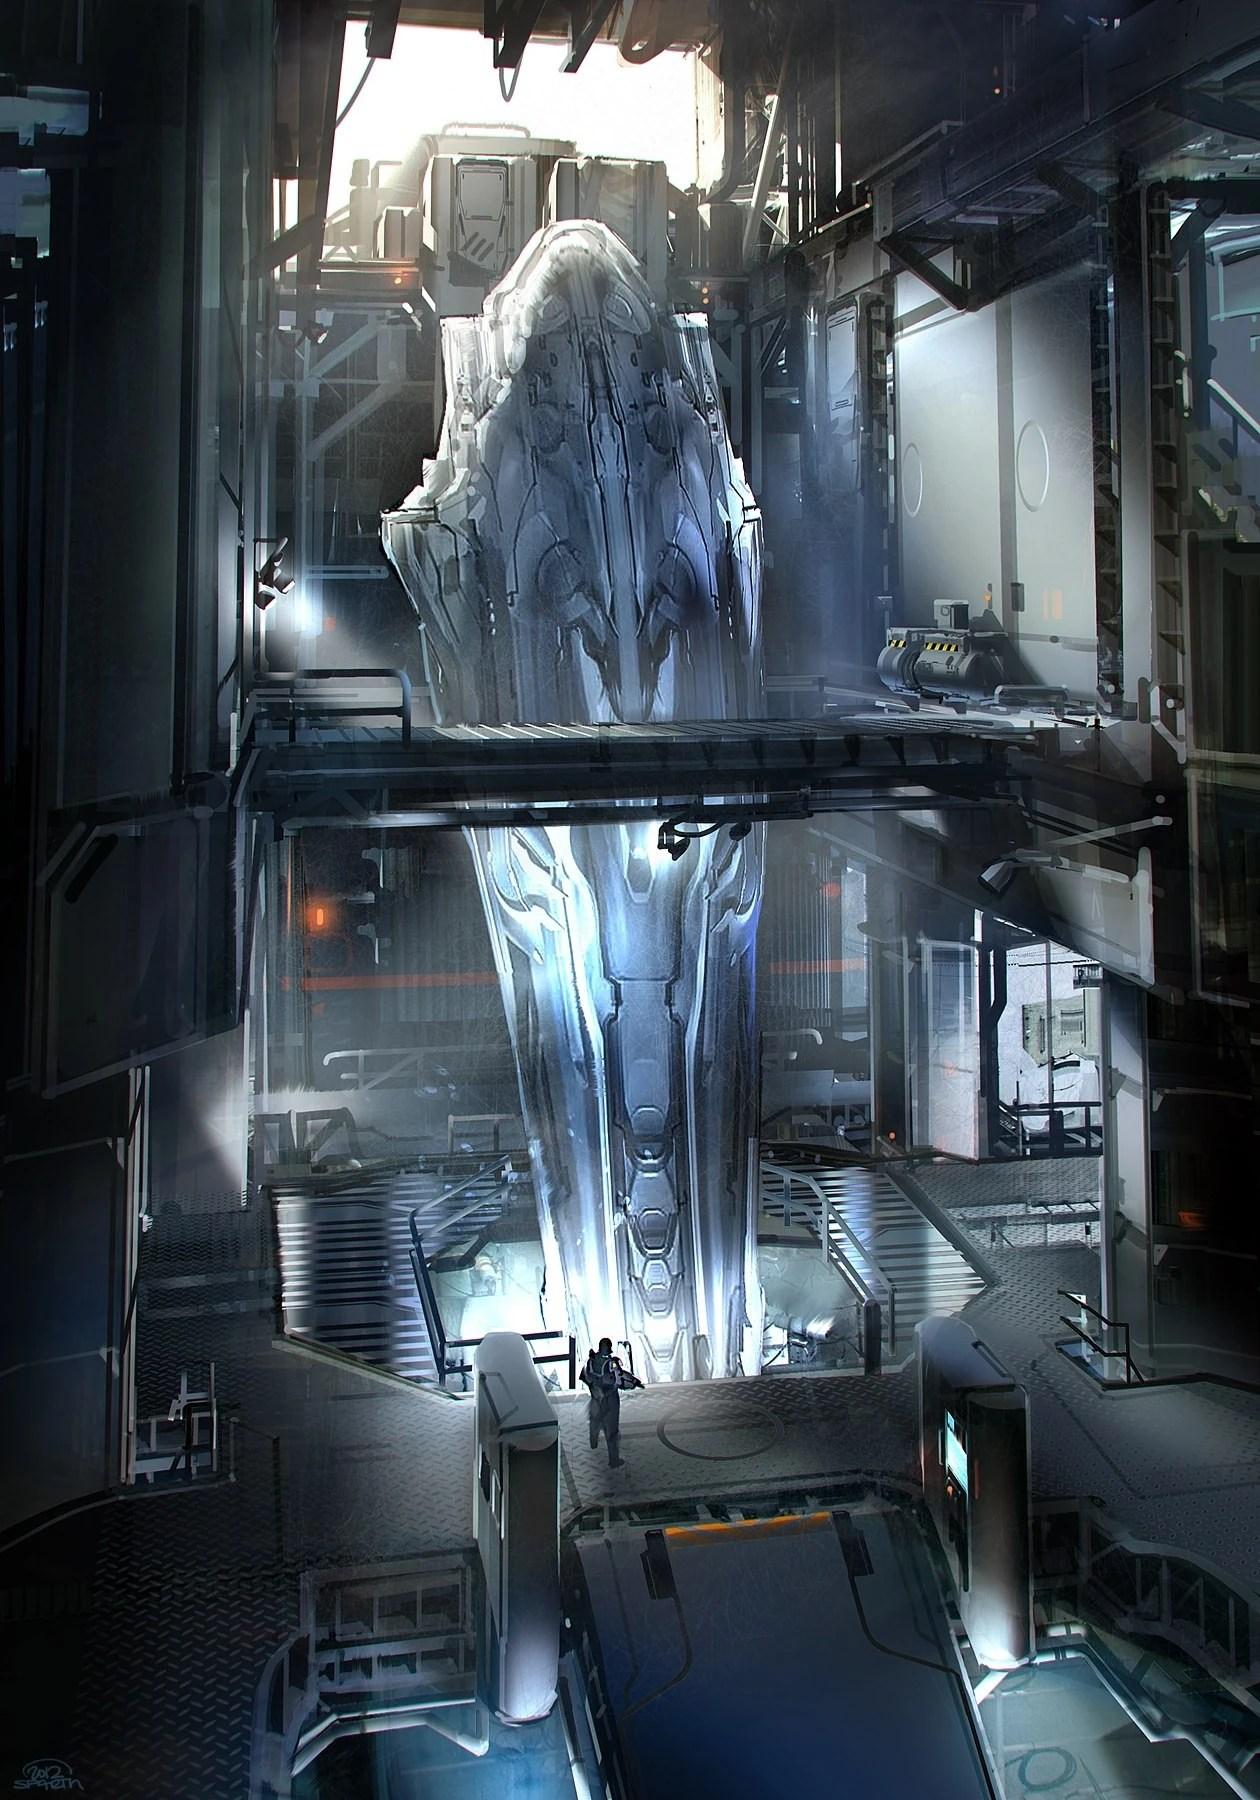 https://i2.wp.com/images.wikia.com/halo/images/4/49/Halo4concept08.jpg